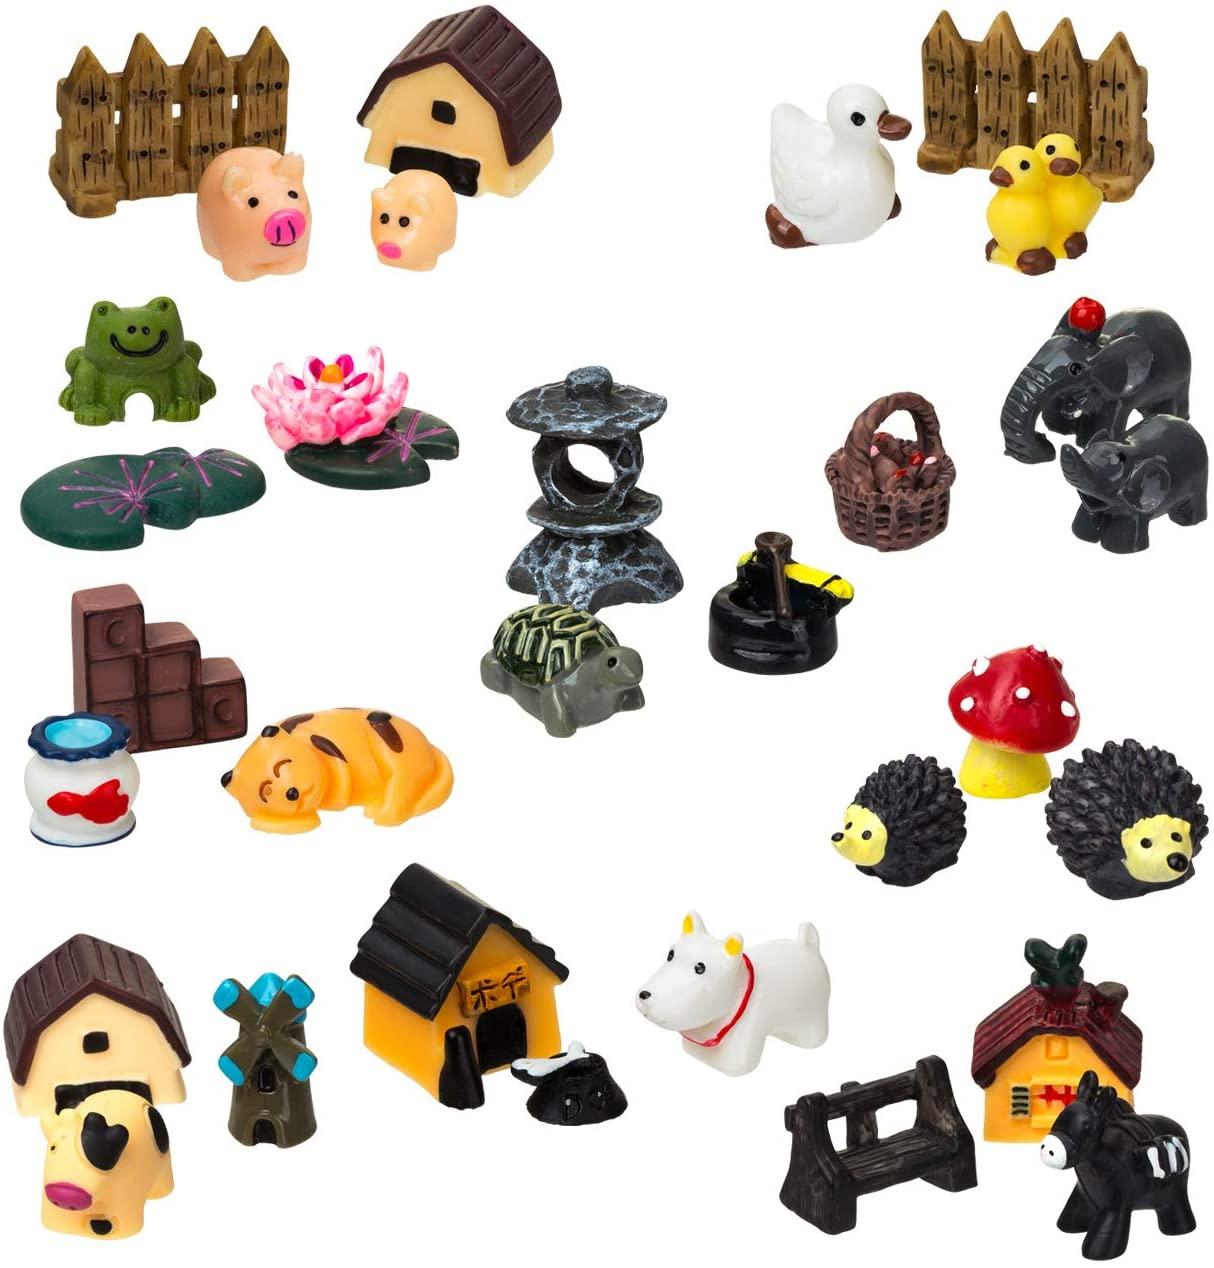 LIHAO 30 Piece Miniature Fairy Garden Ornaments, Miniature Tortoise, Frog, Hedgehog, Villaand More Accessories for Fairy Garden Decoration